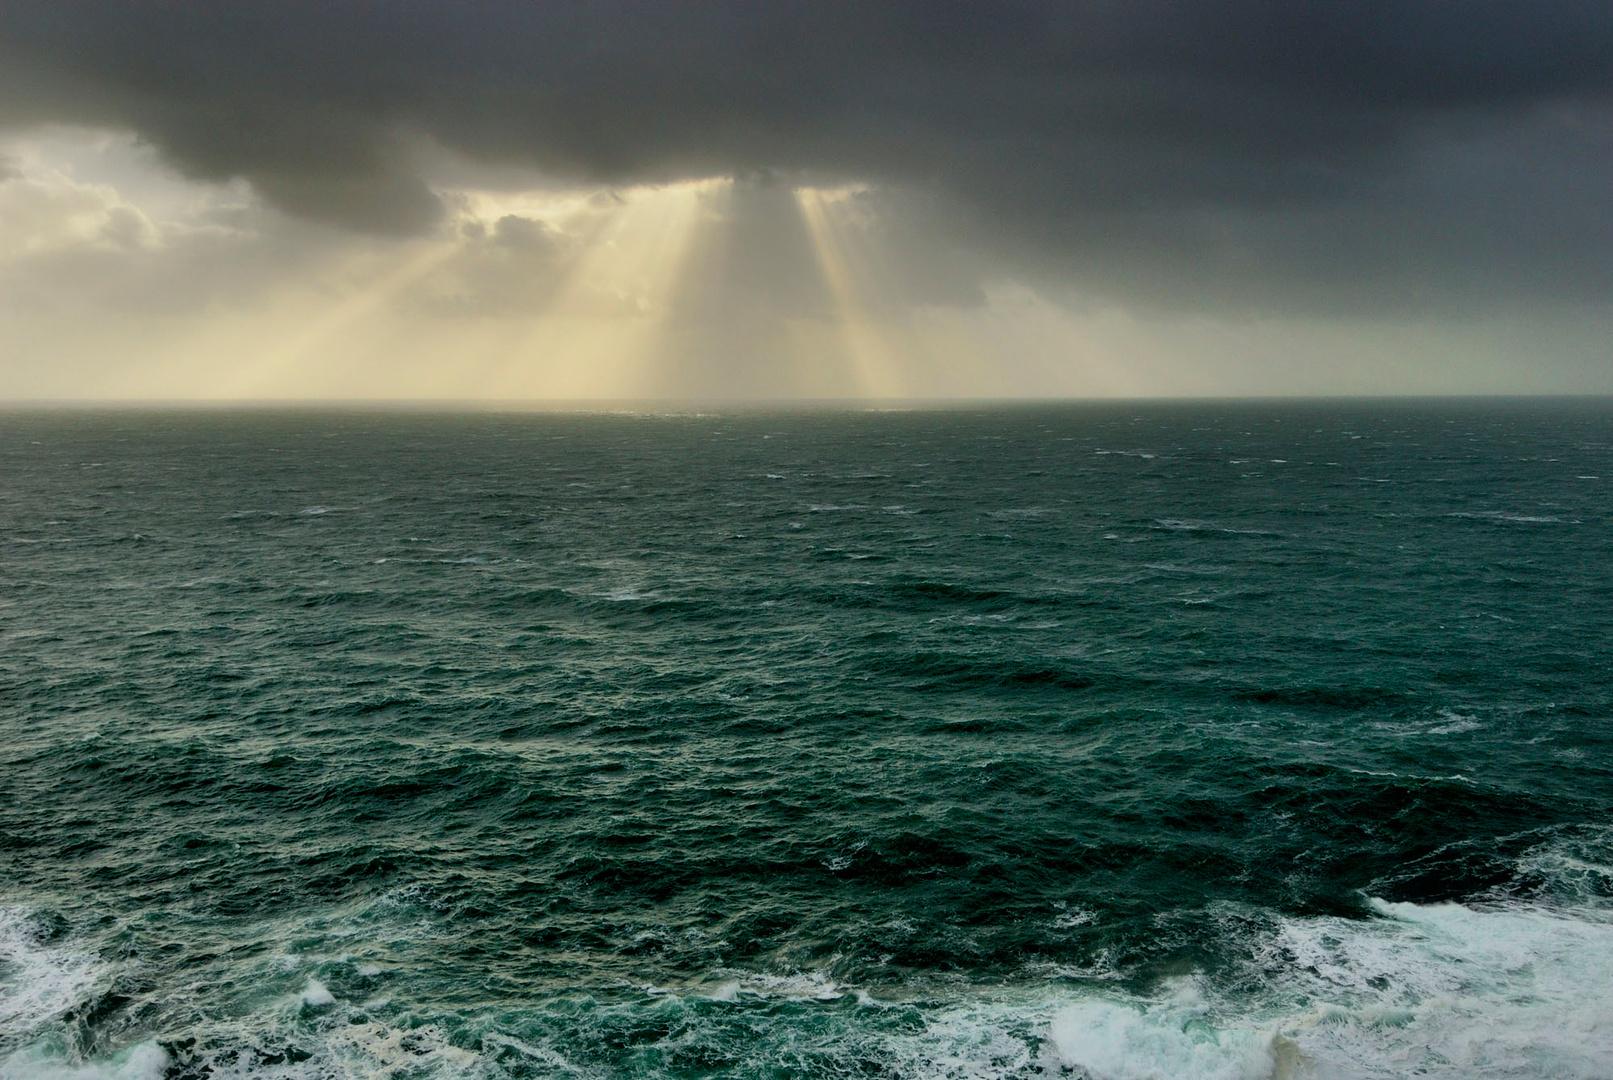 Mer d'Iroise,Finistère,2006